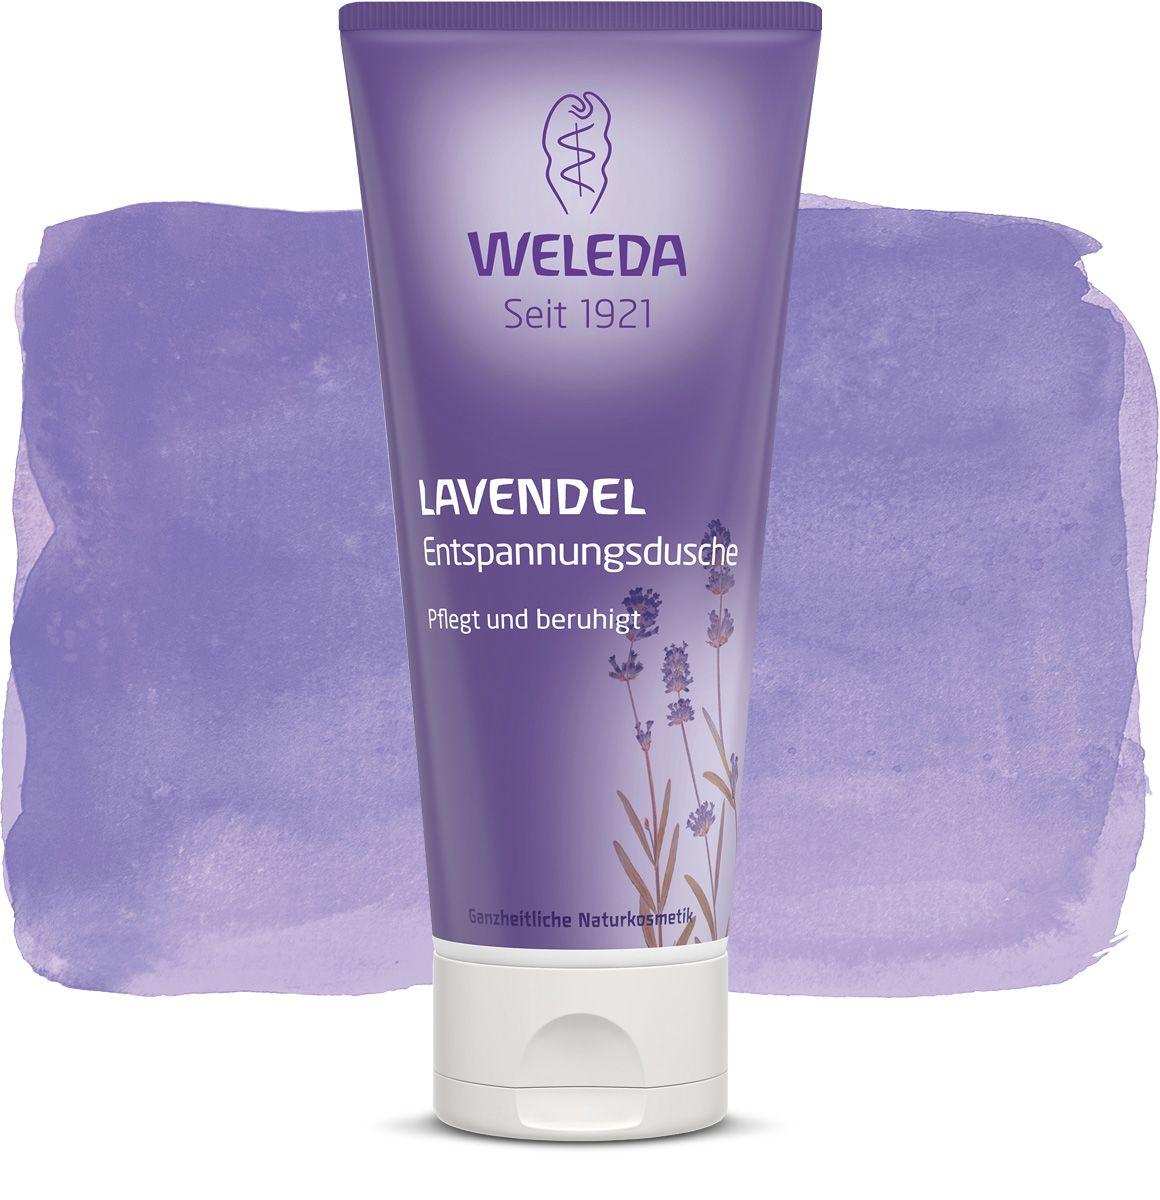 Lavendel Entspannungsdusche (200ml)